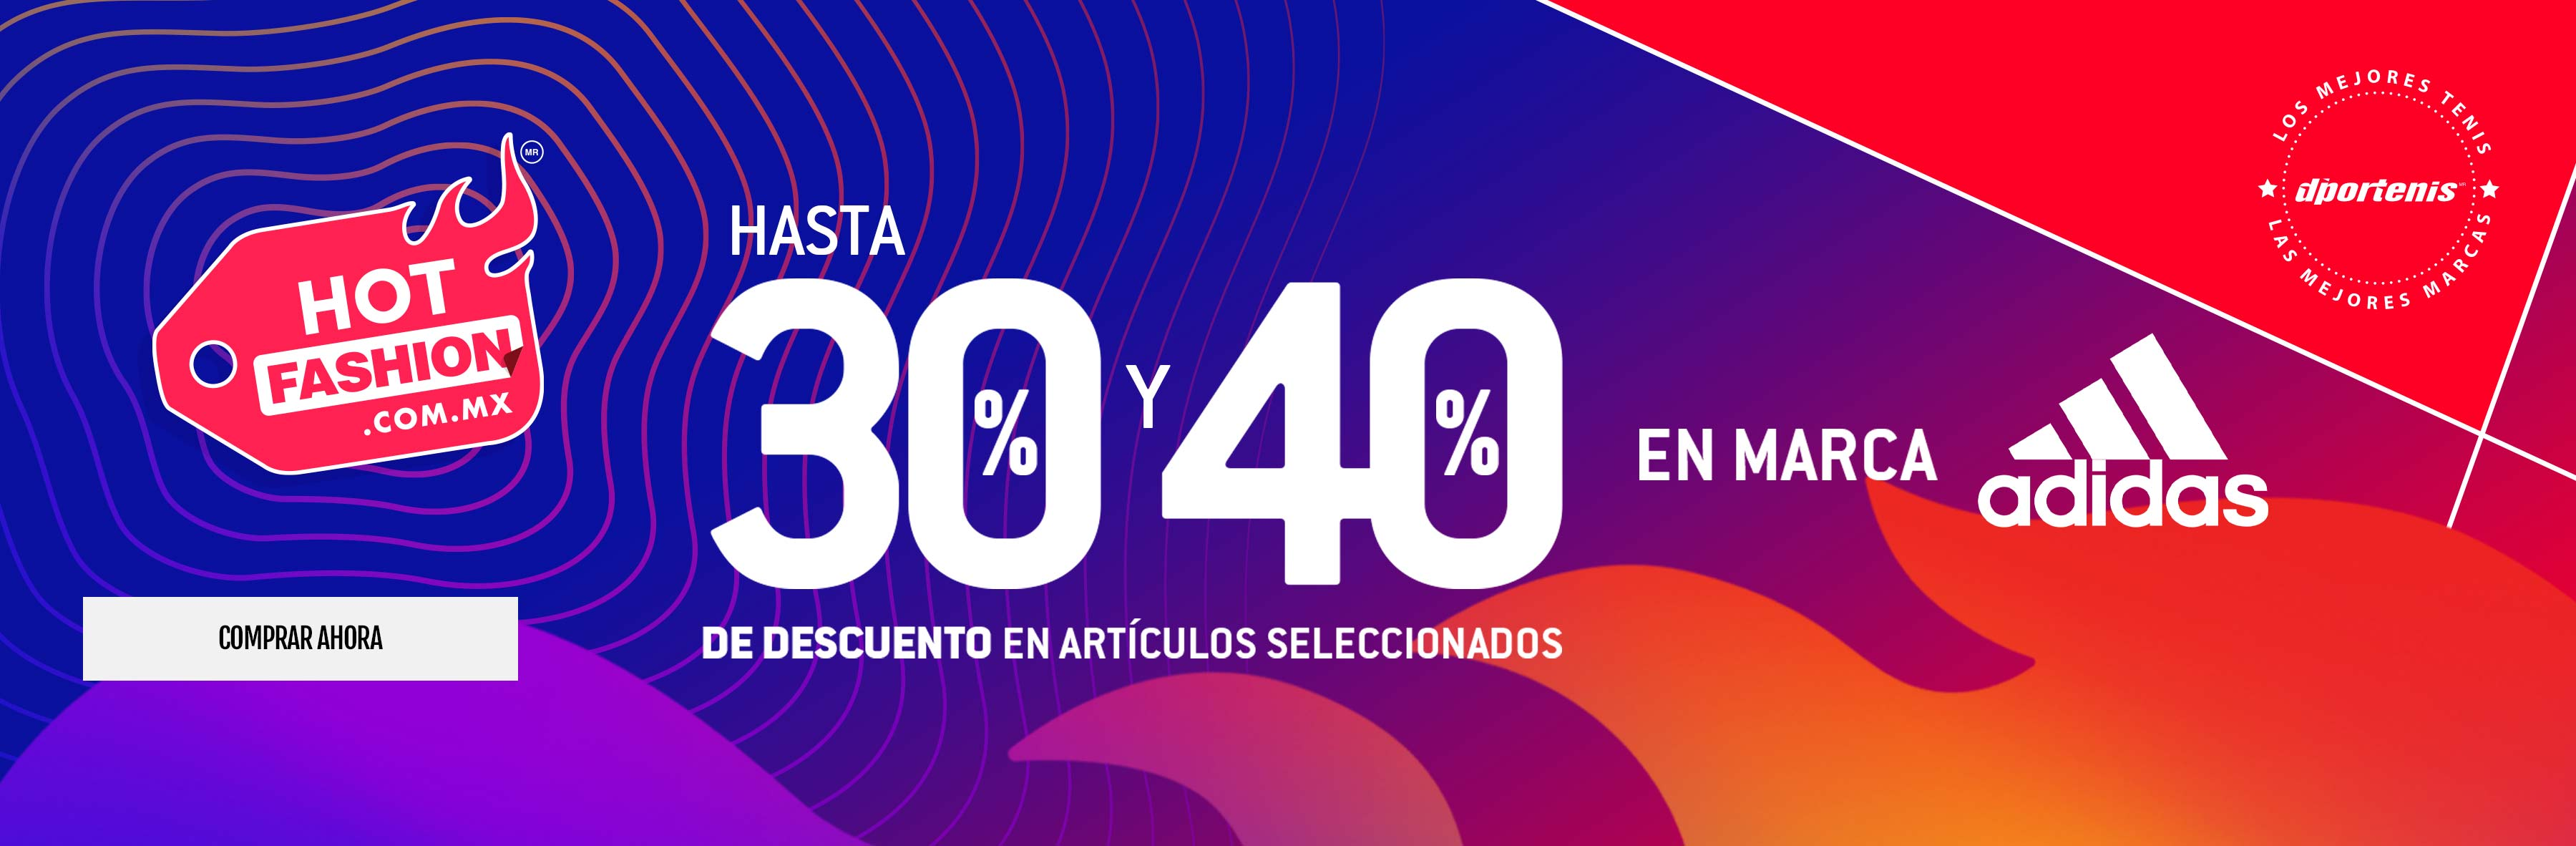 HASTA 30% Y 40% ADIDAS